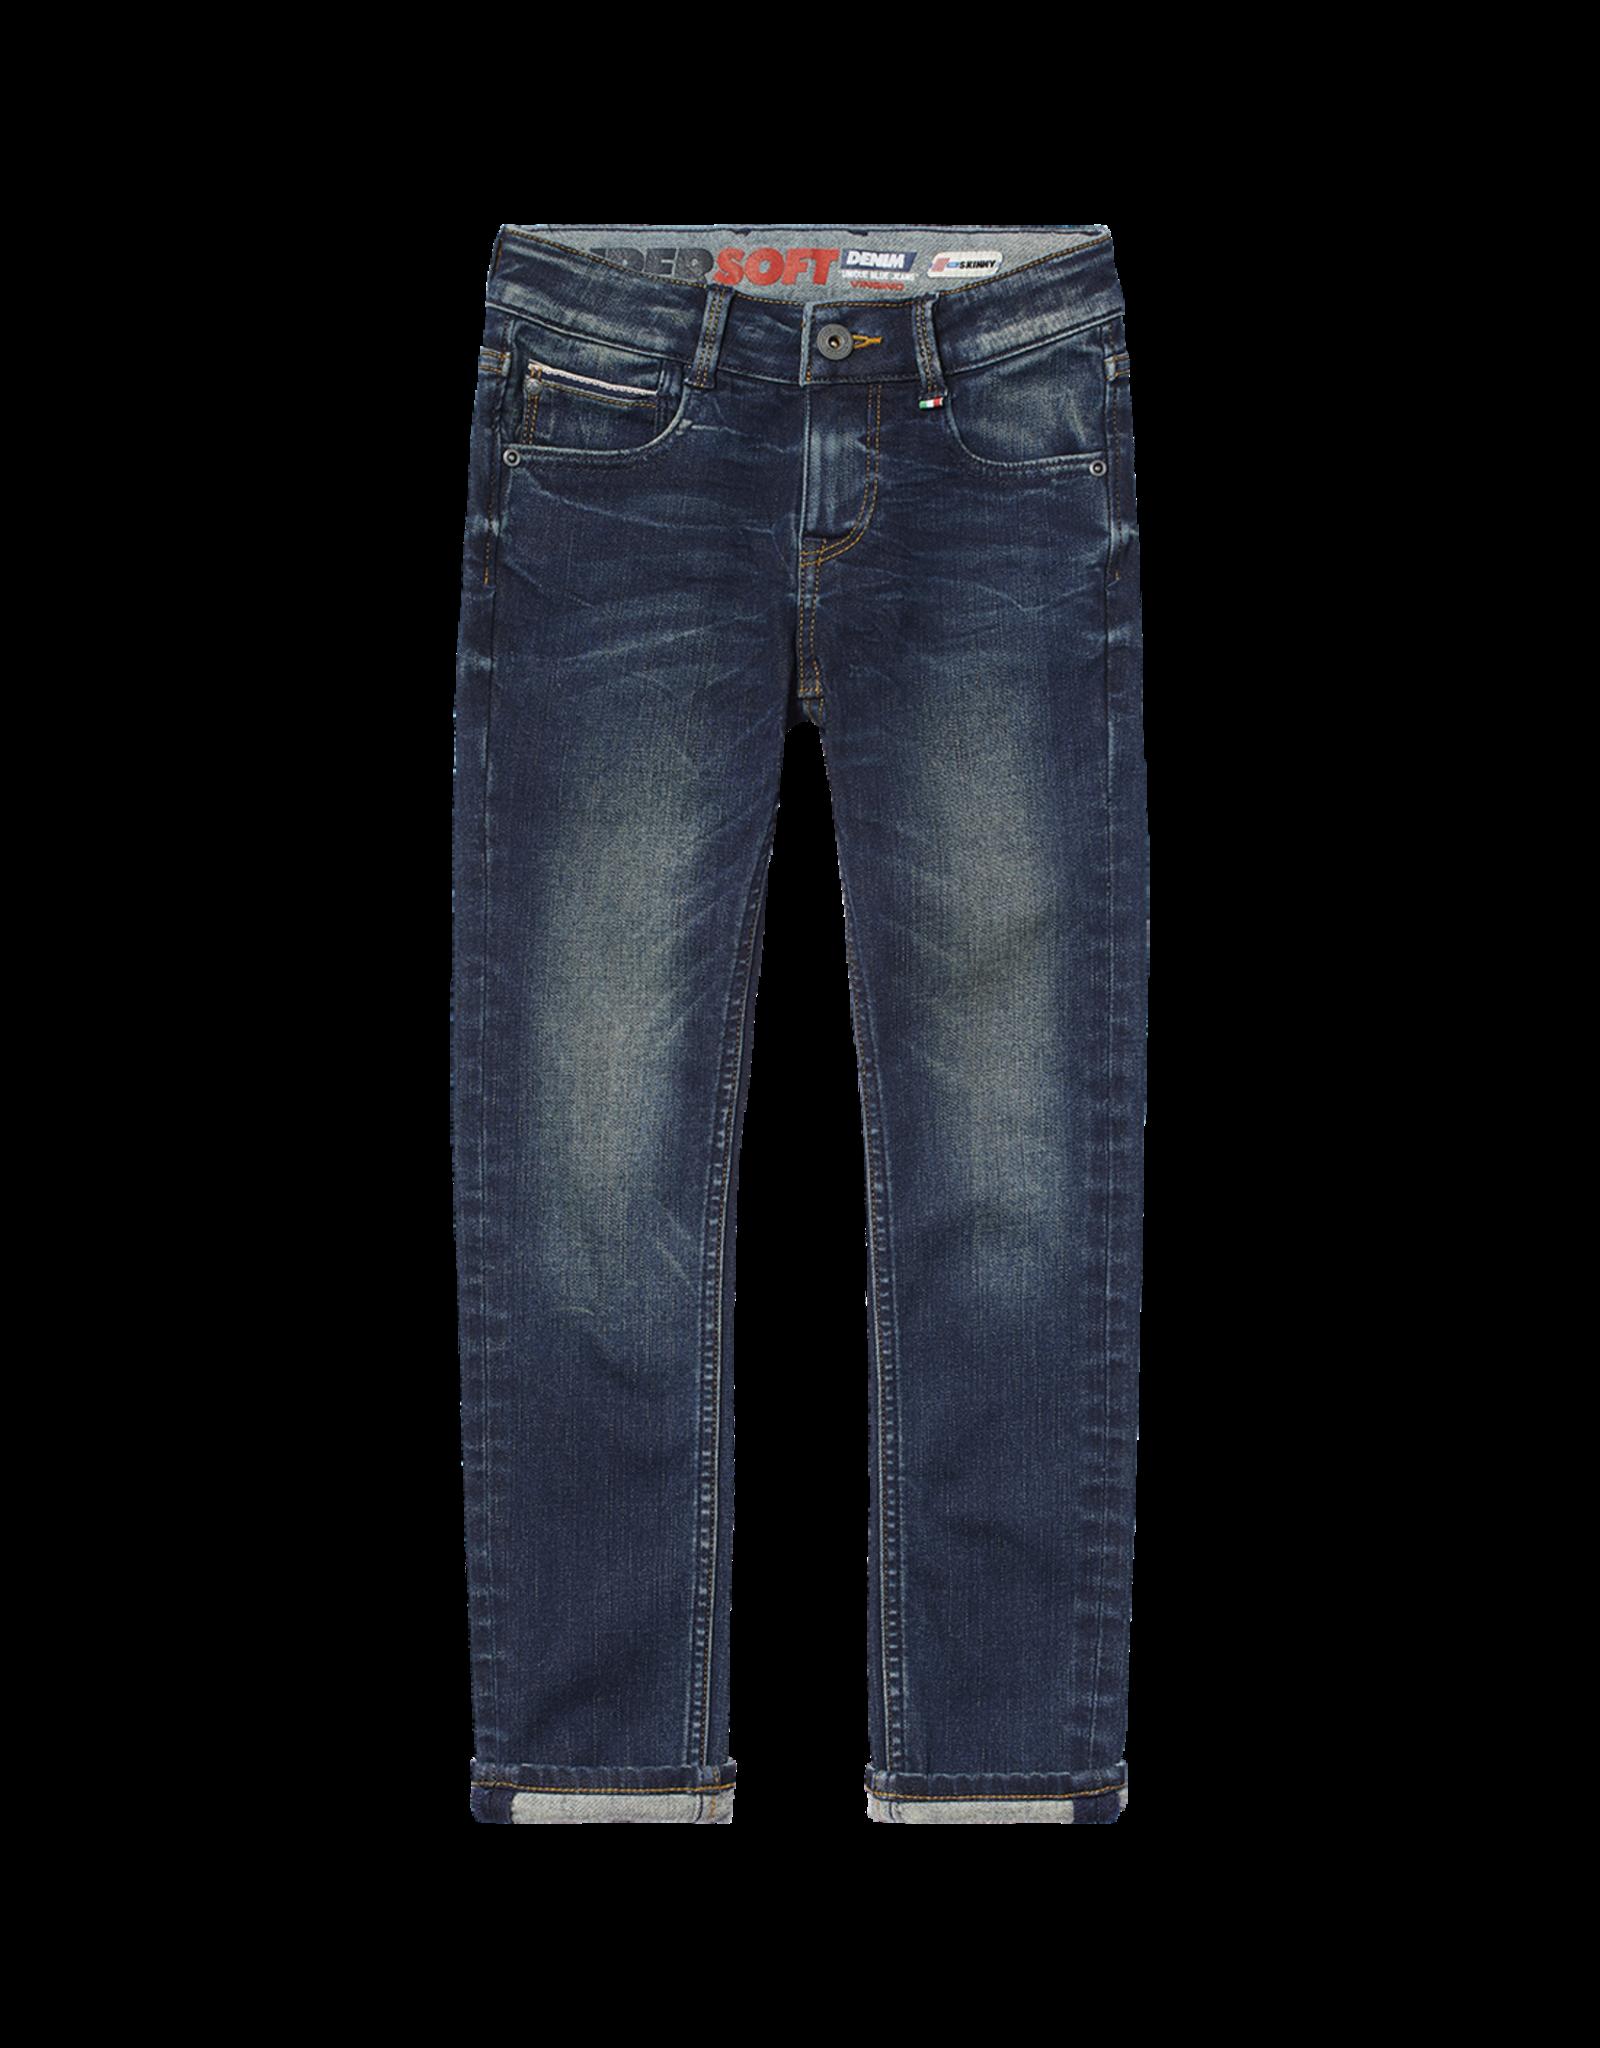 Vingino Amos Jeans 161 Cruziale Blue